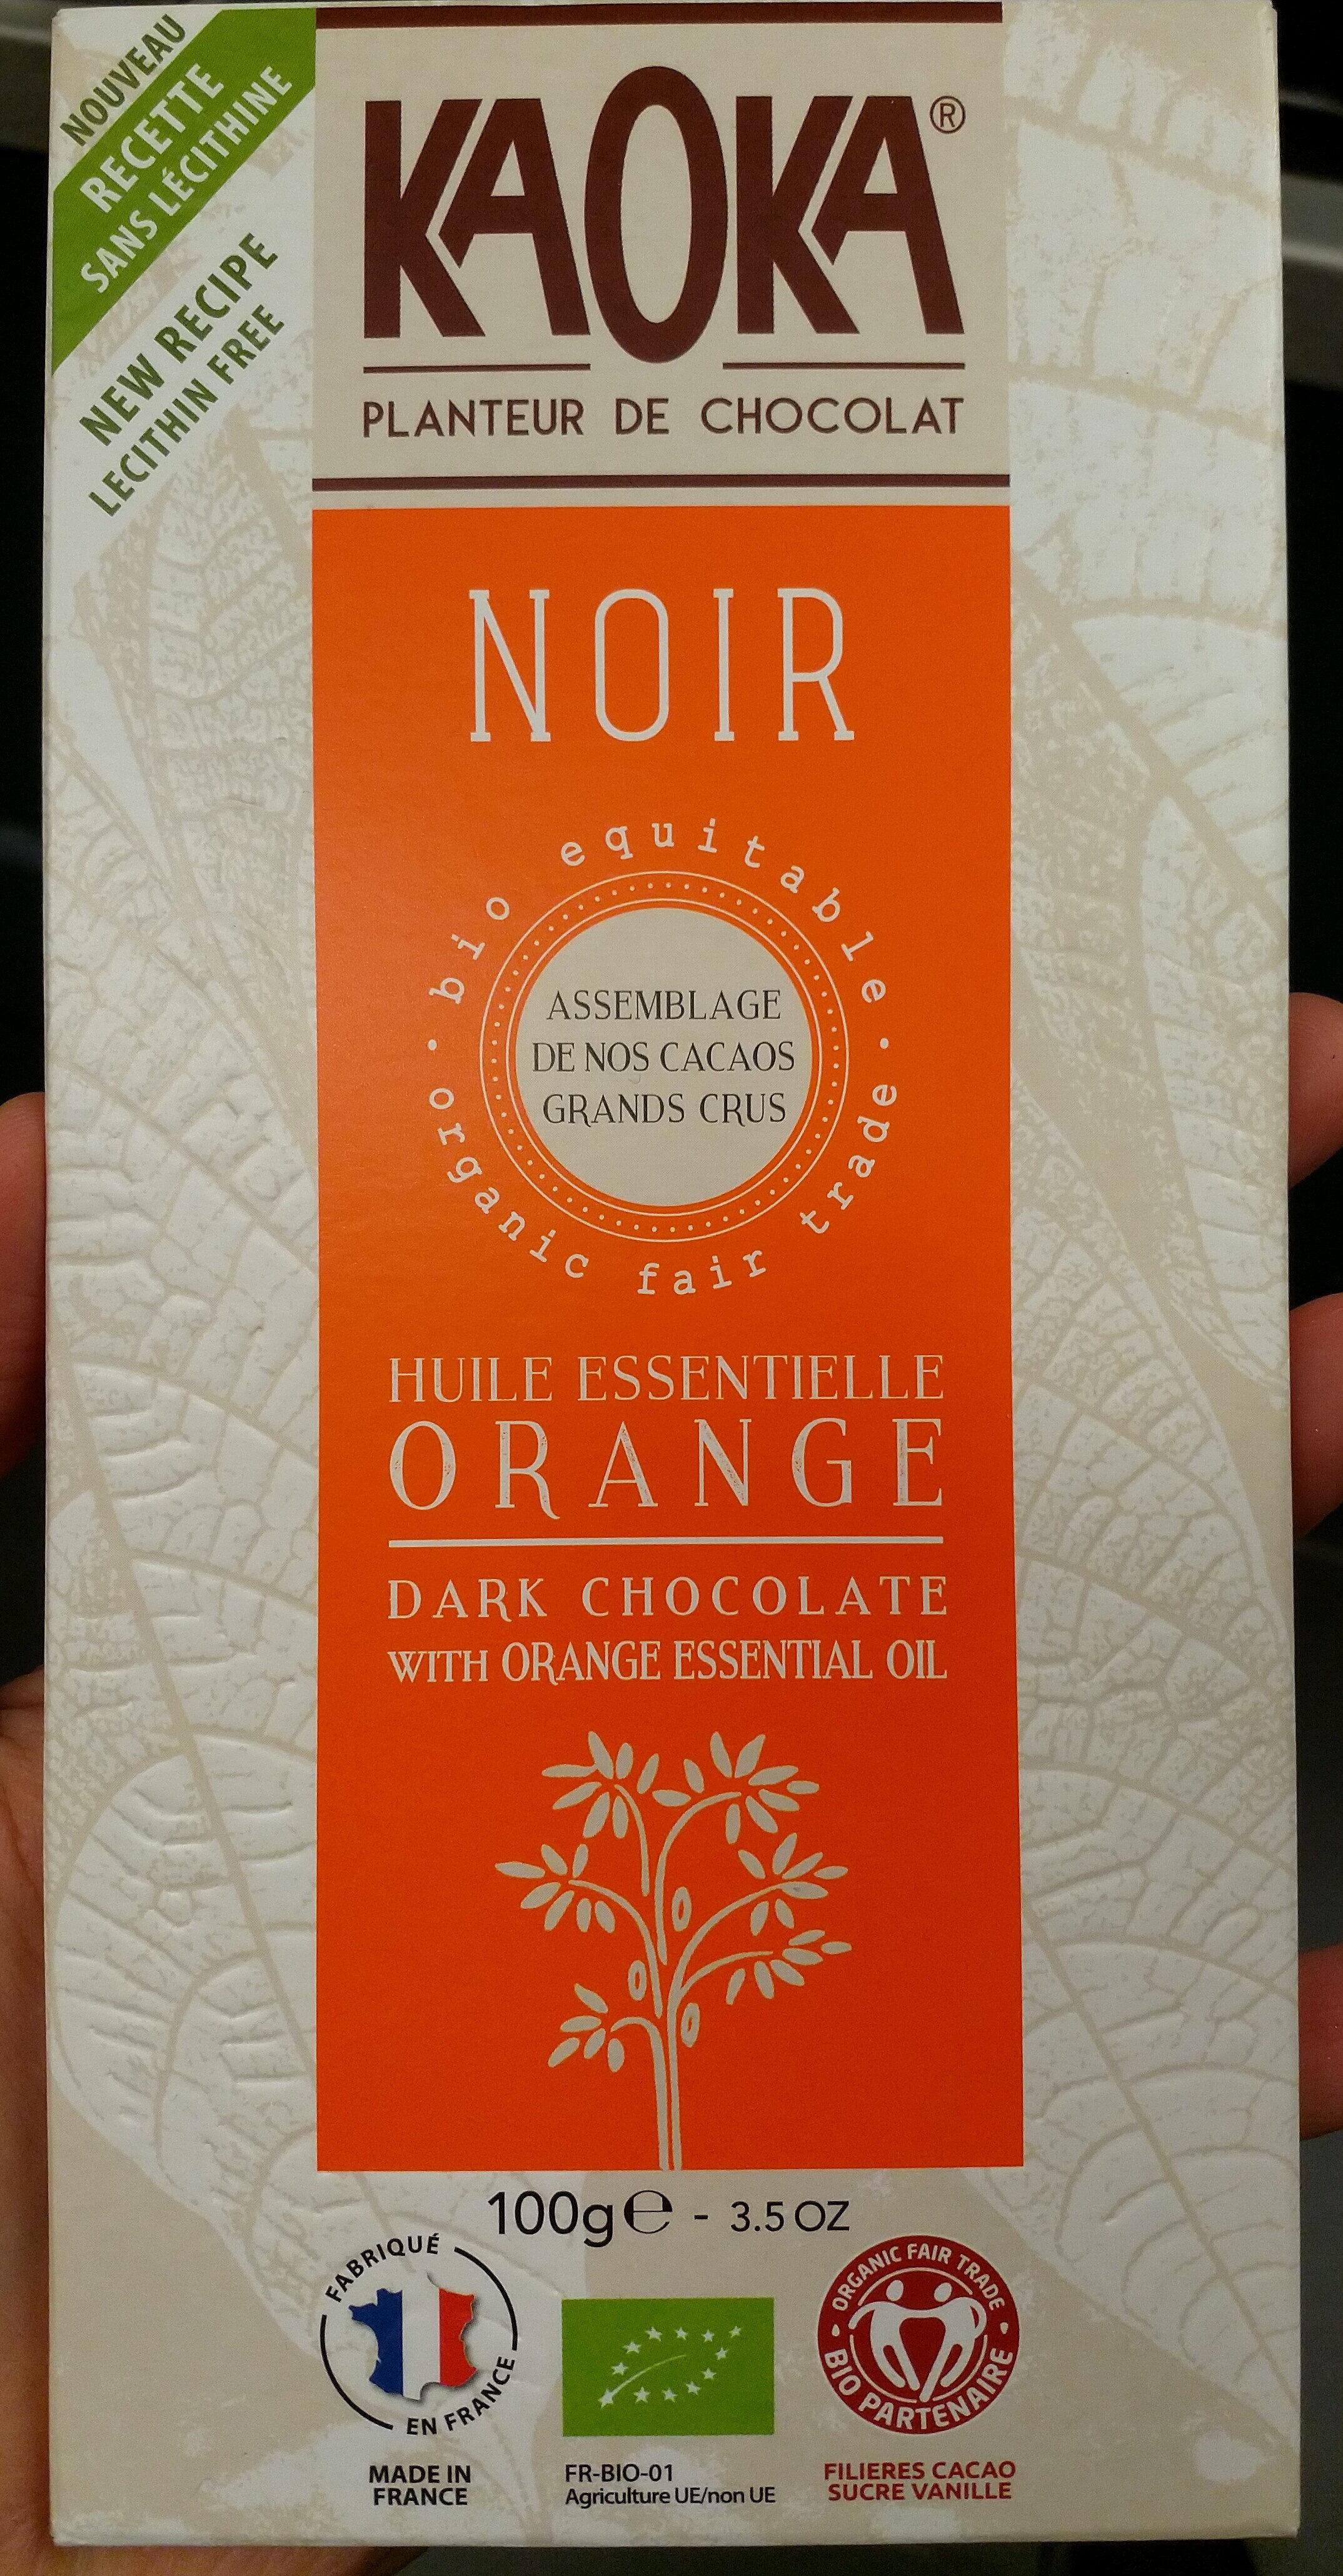 Chocolat noir huile essentielle orange - Product